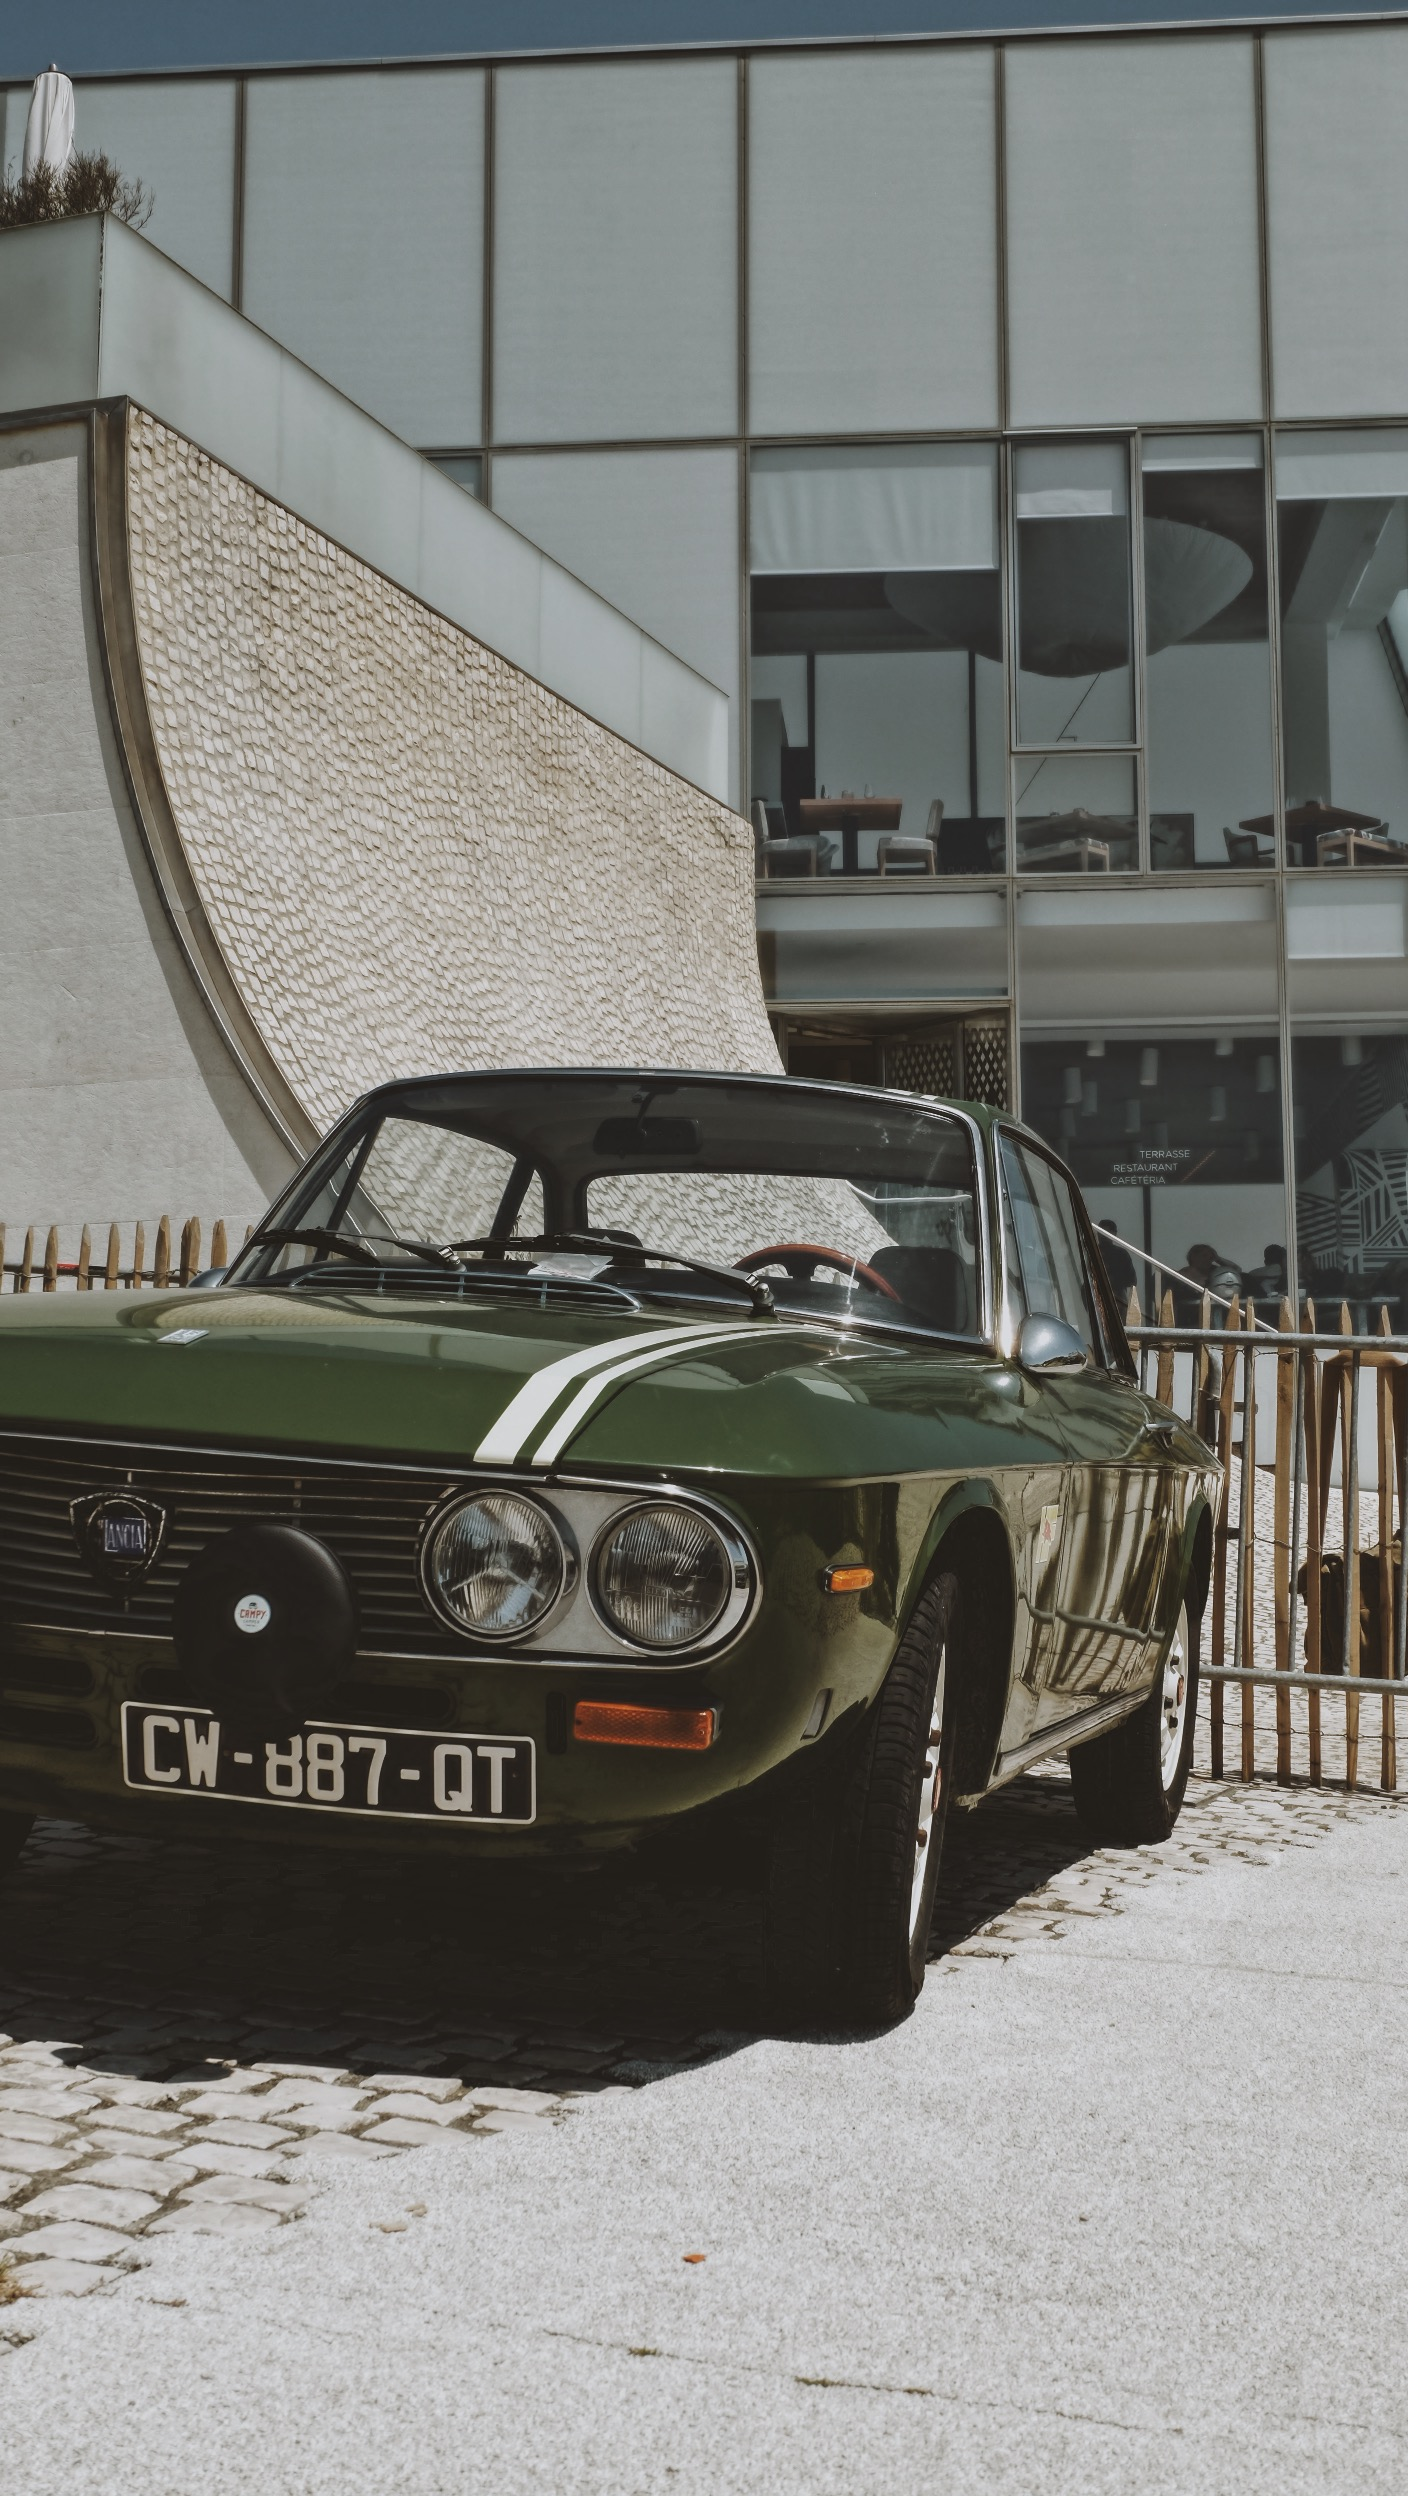 Vintage car - Lancia Fulvia